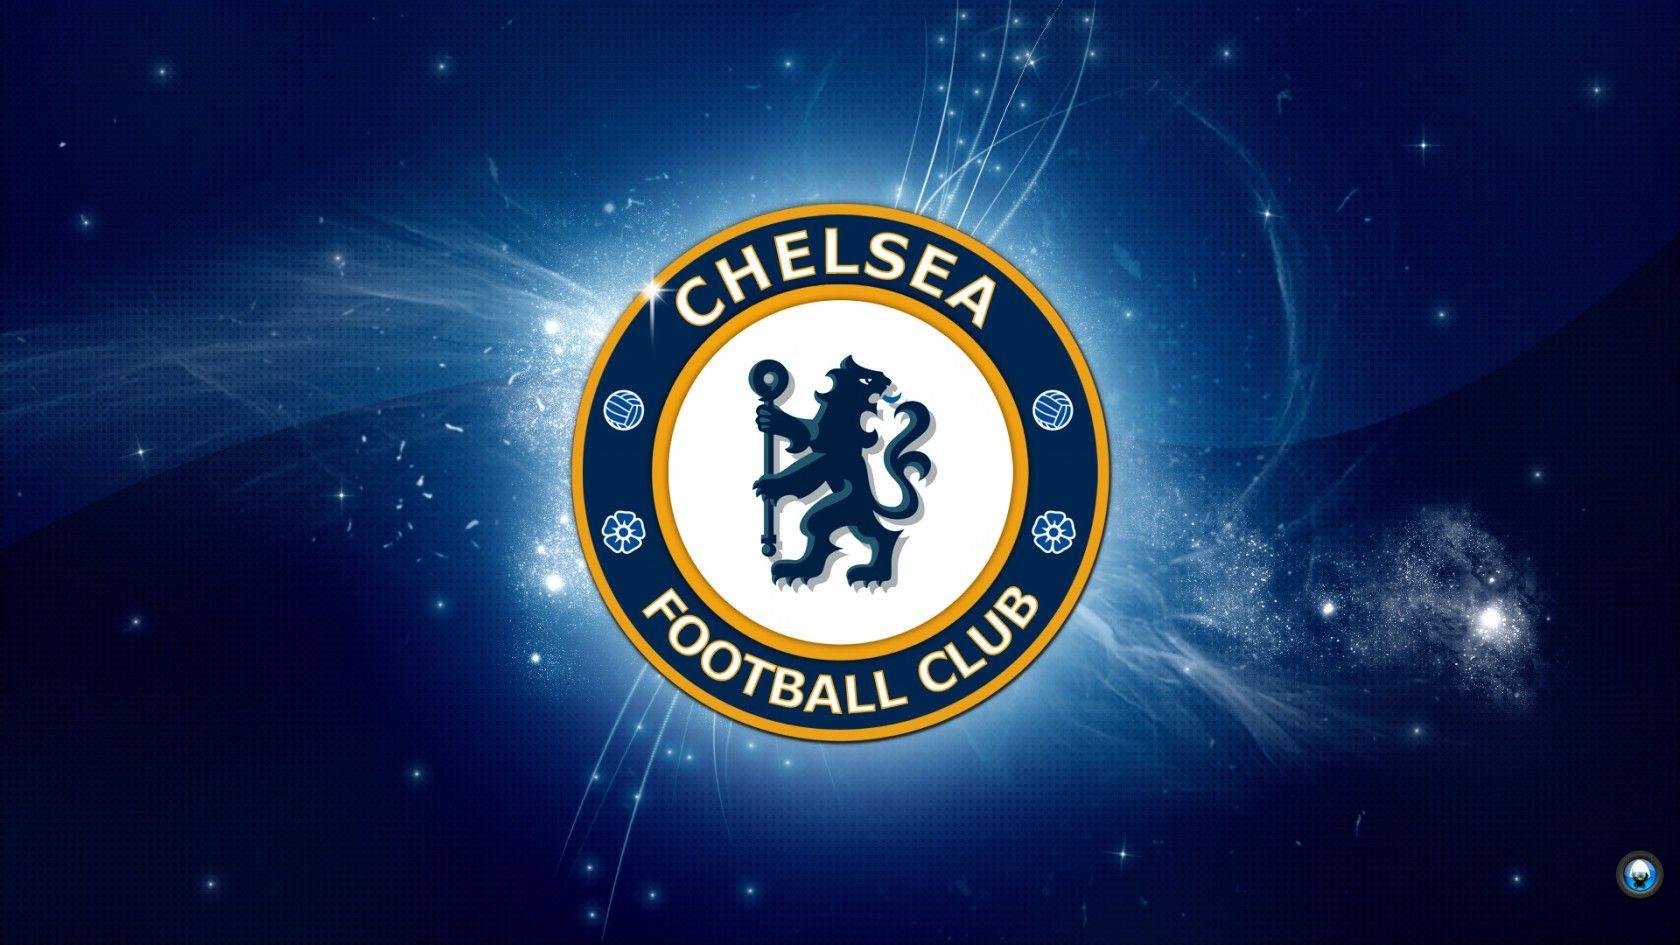 Chelsea Pinterest: Chelsea FC Logo 2013 HD Wallpaper